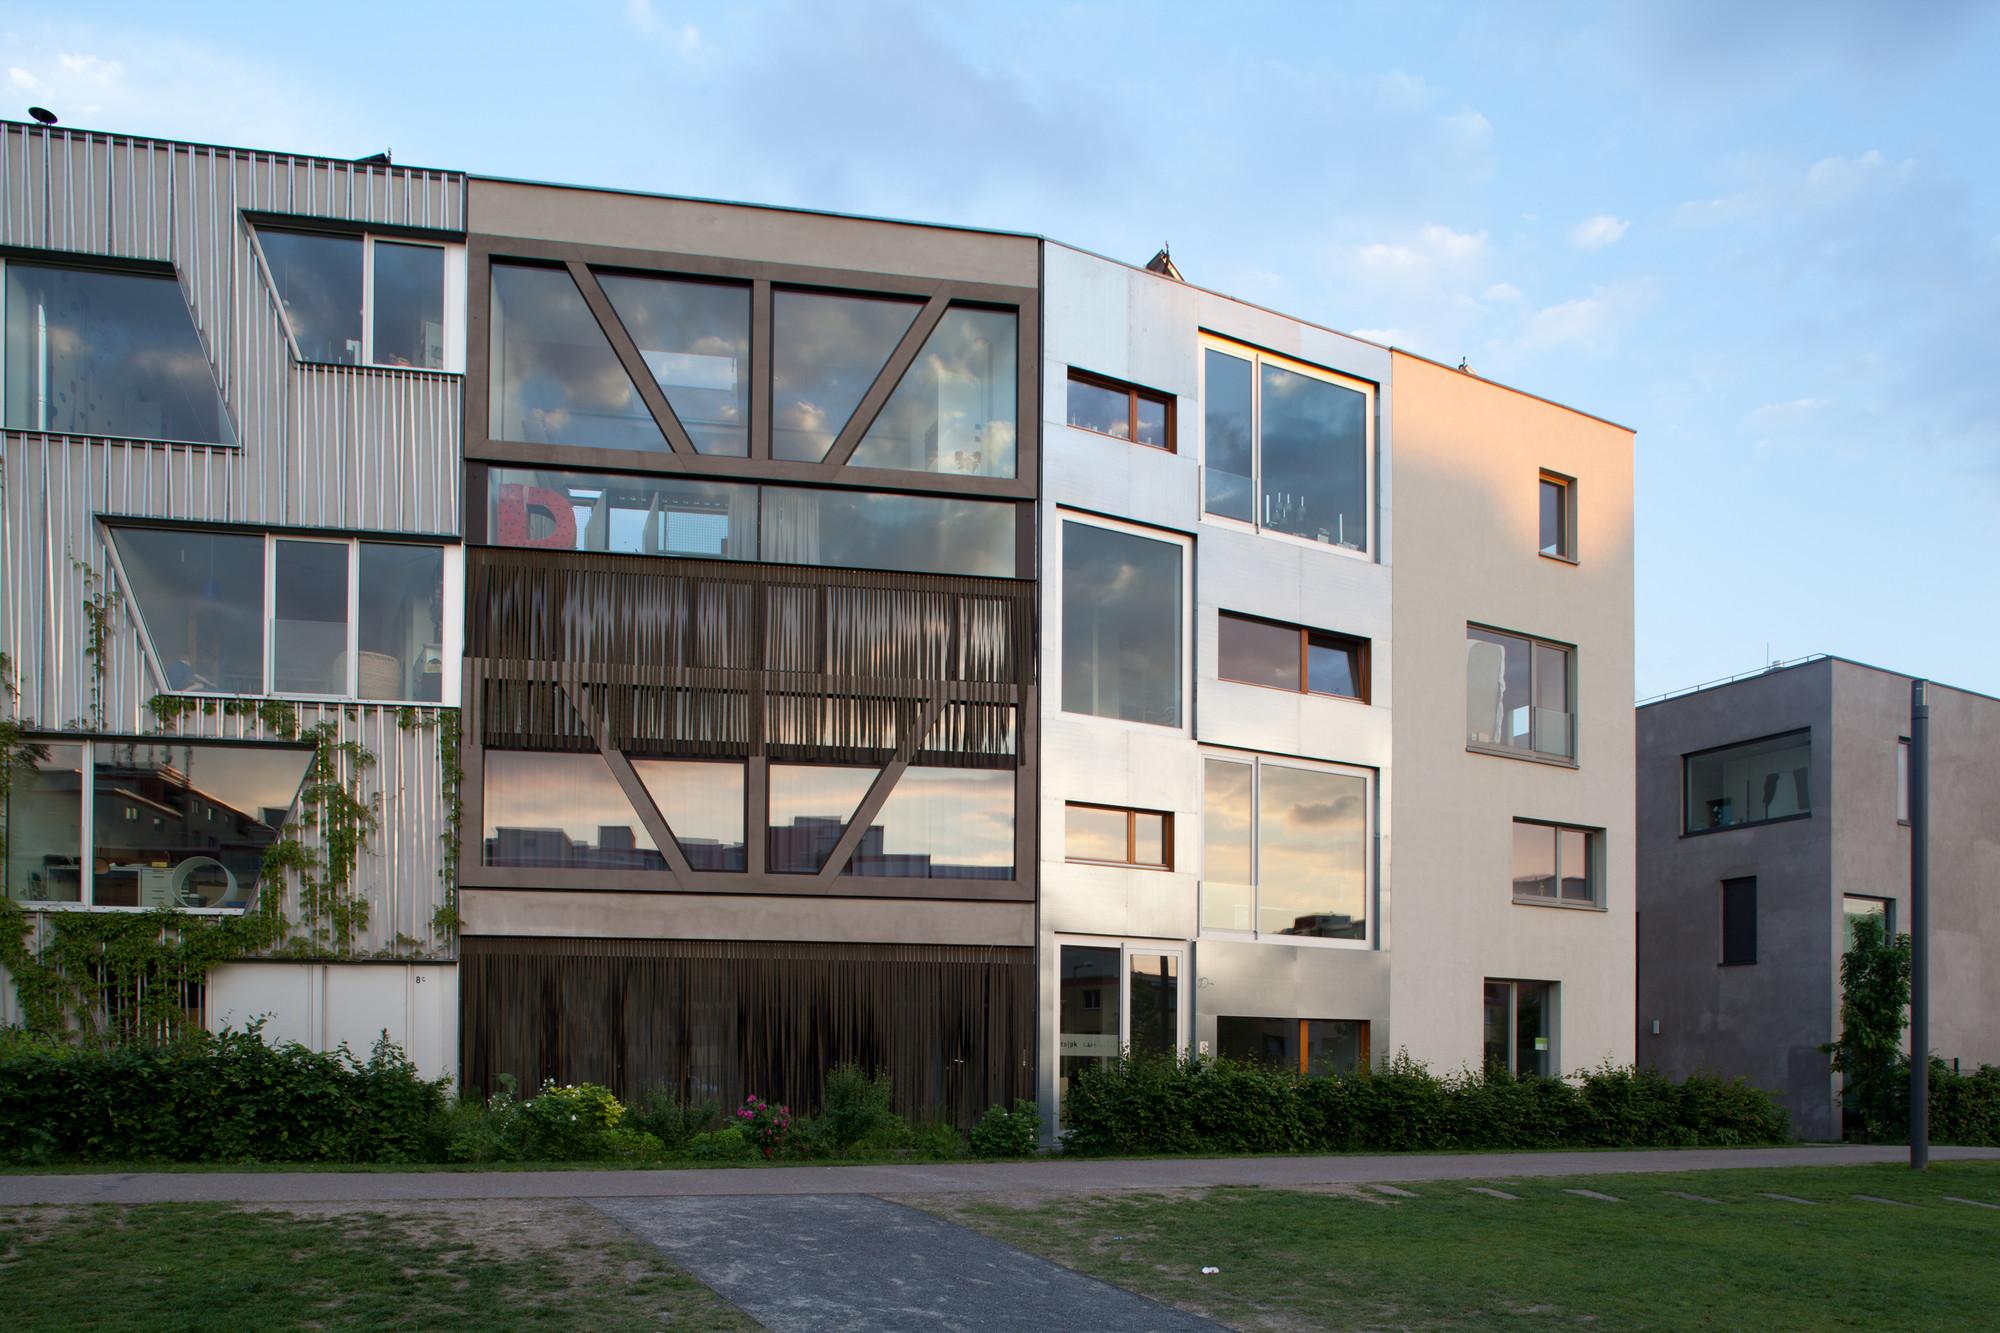 Gallery of townhouse b14 xth berlin 6 - Walmdach moderne architektur ...